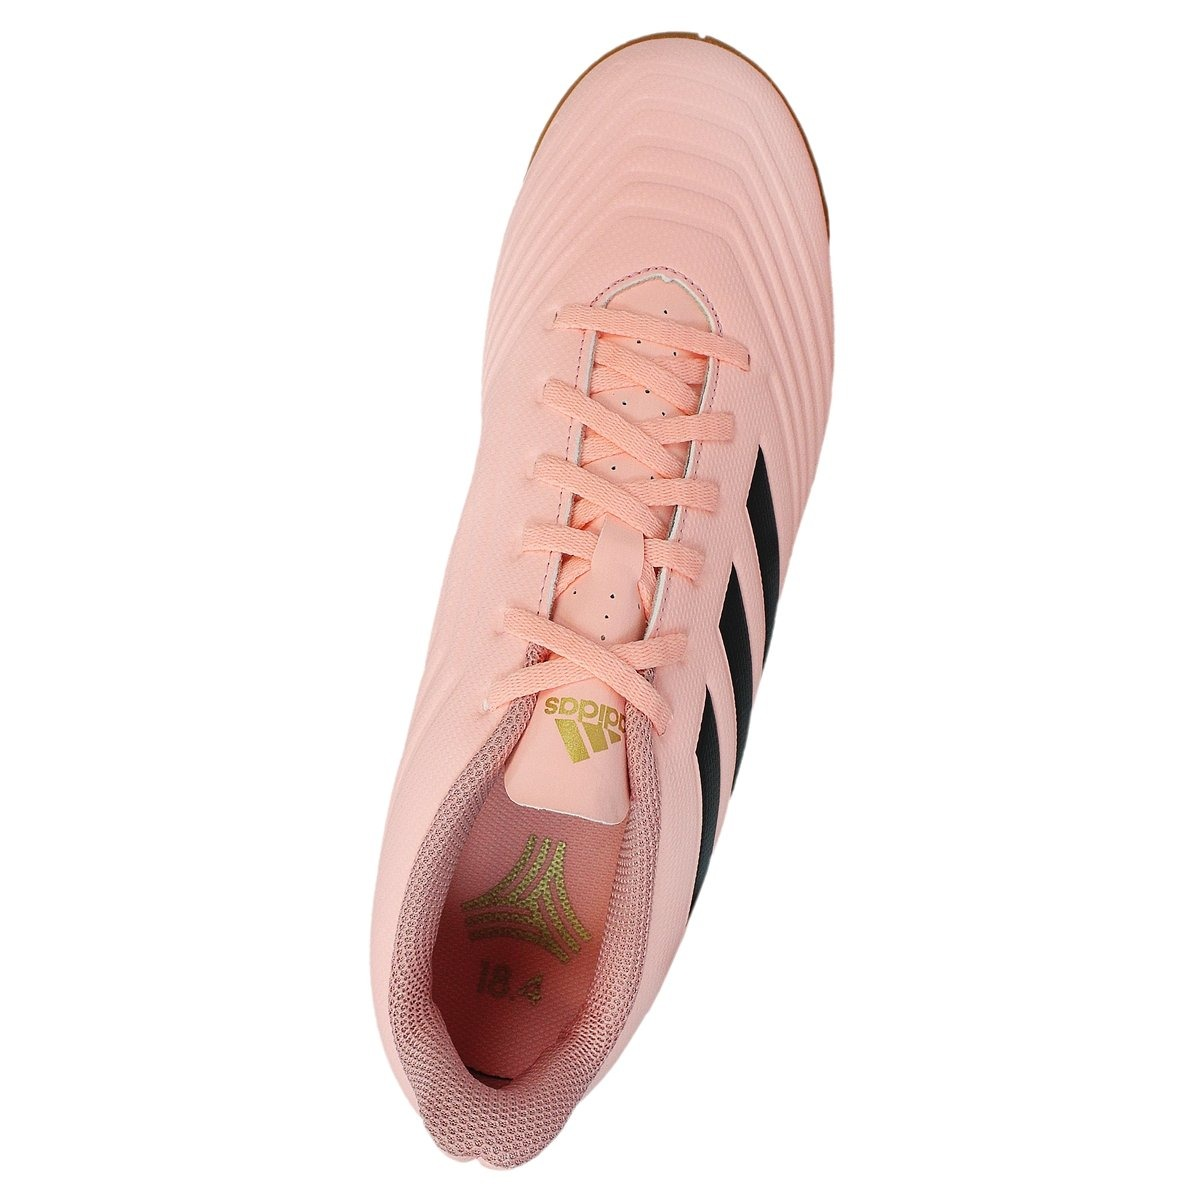 e4c0021d26206 chuteira futsal adidas predator 18 tango 4 | radan esportes. Carregando  zoom.